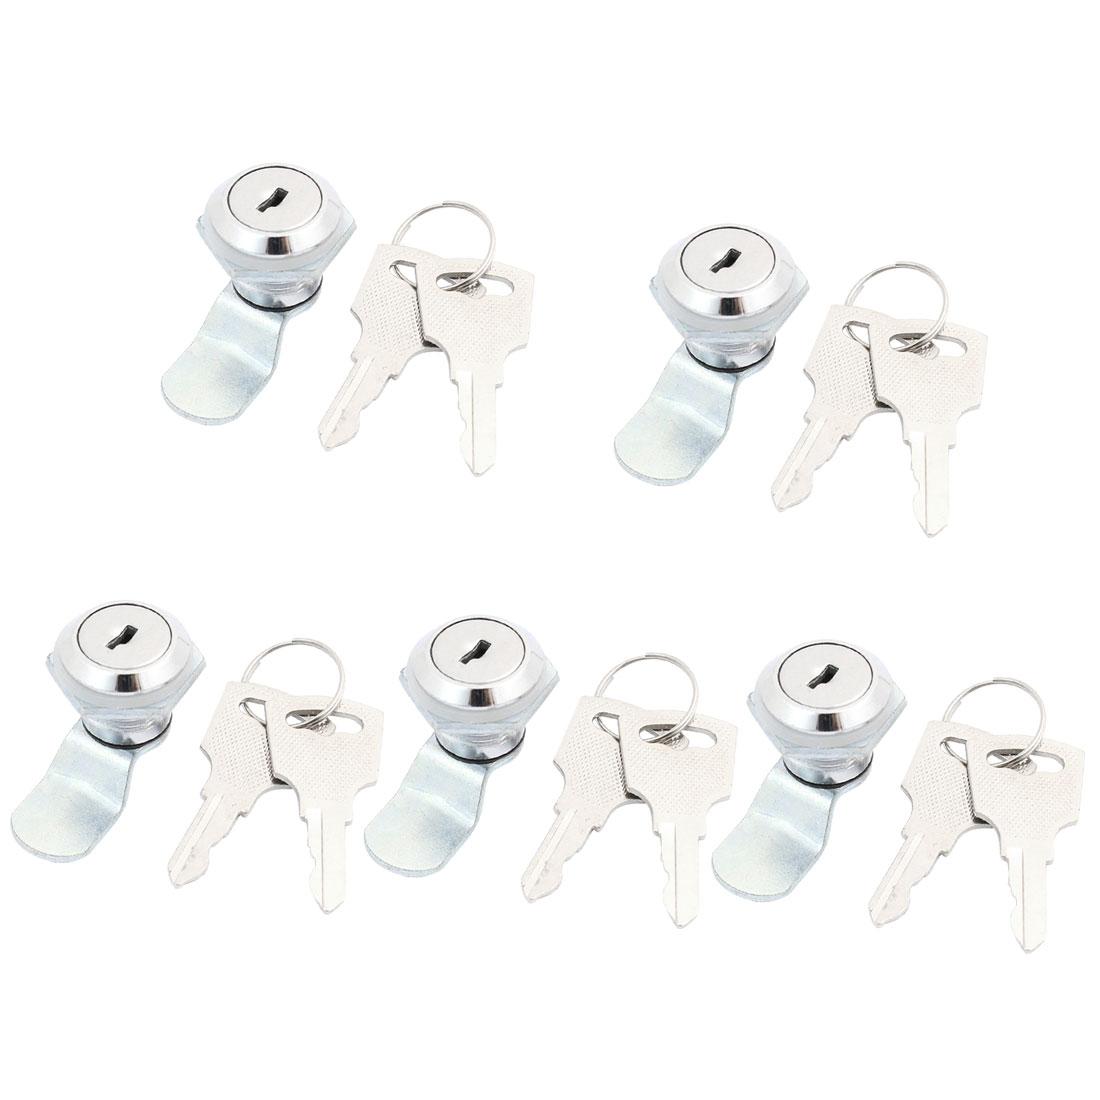 5 Pcs Tool Box Cabinet Locking 17mm Dia Thread Cylinder Cam Lock + Keys